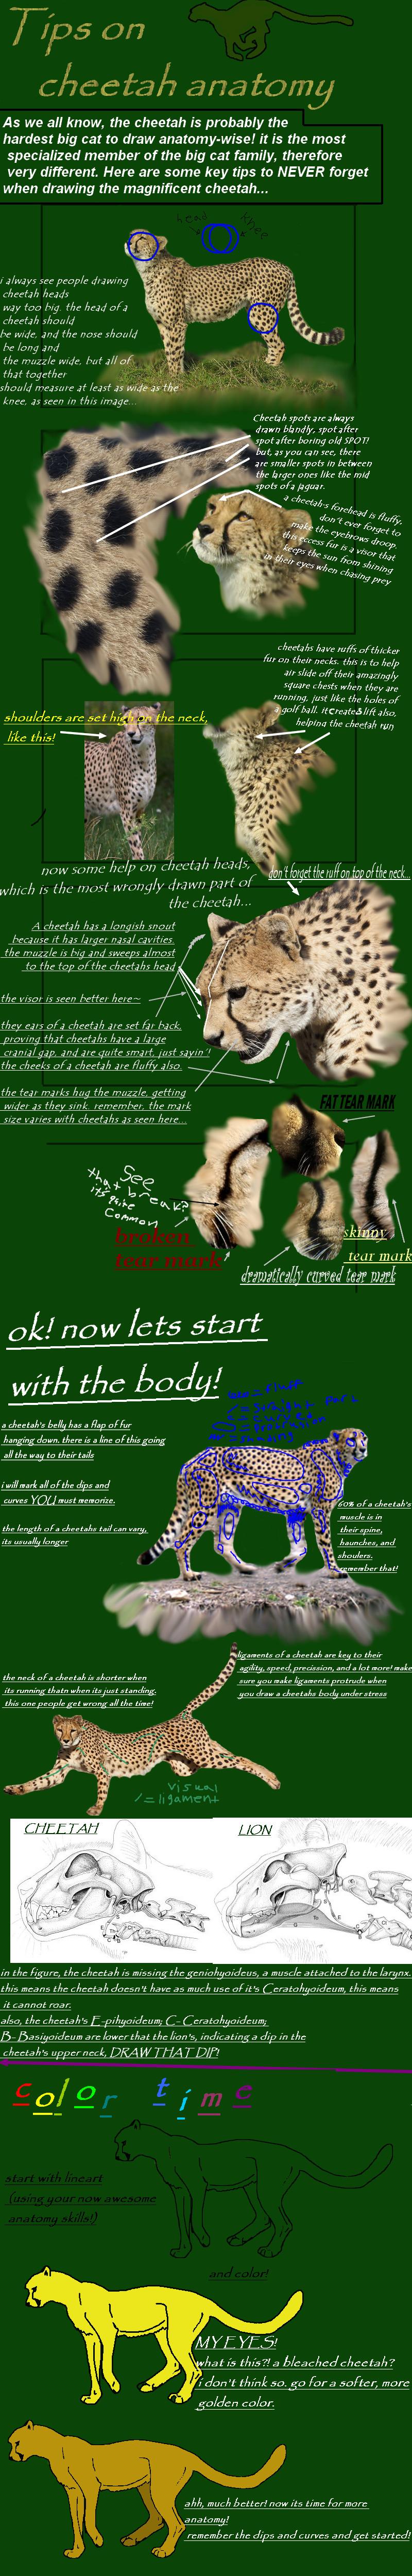 cheetah anatomy tutorial by cheetahsintheearth